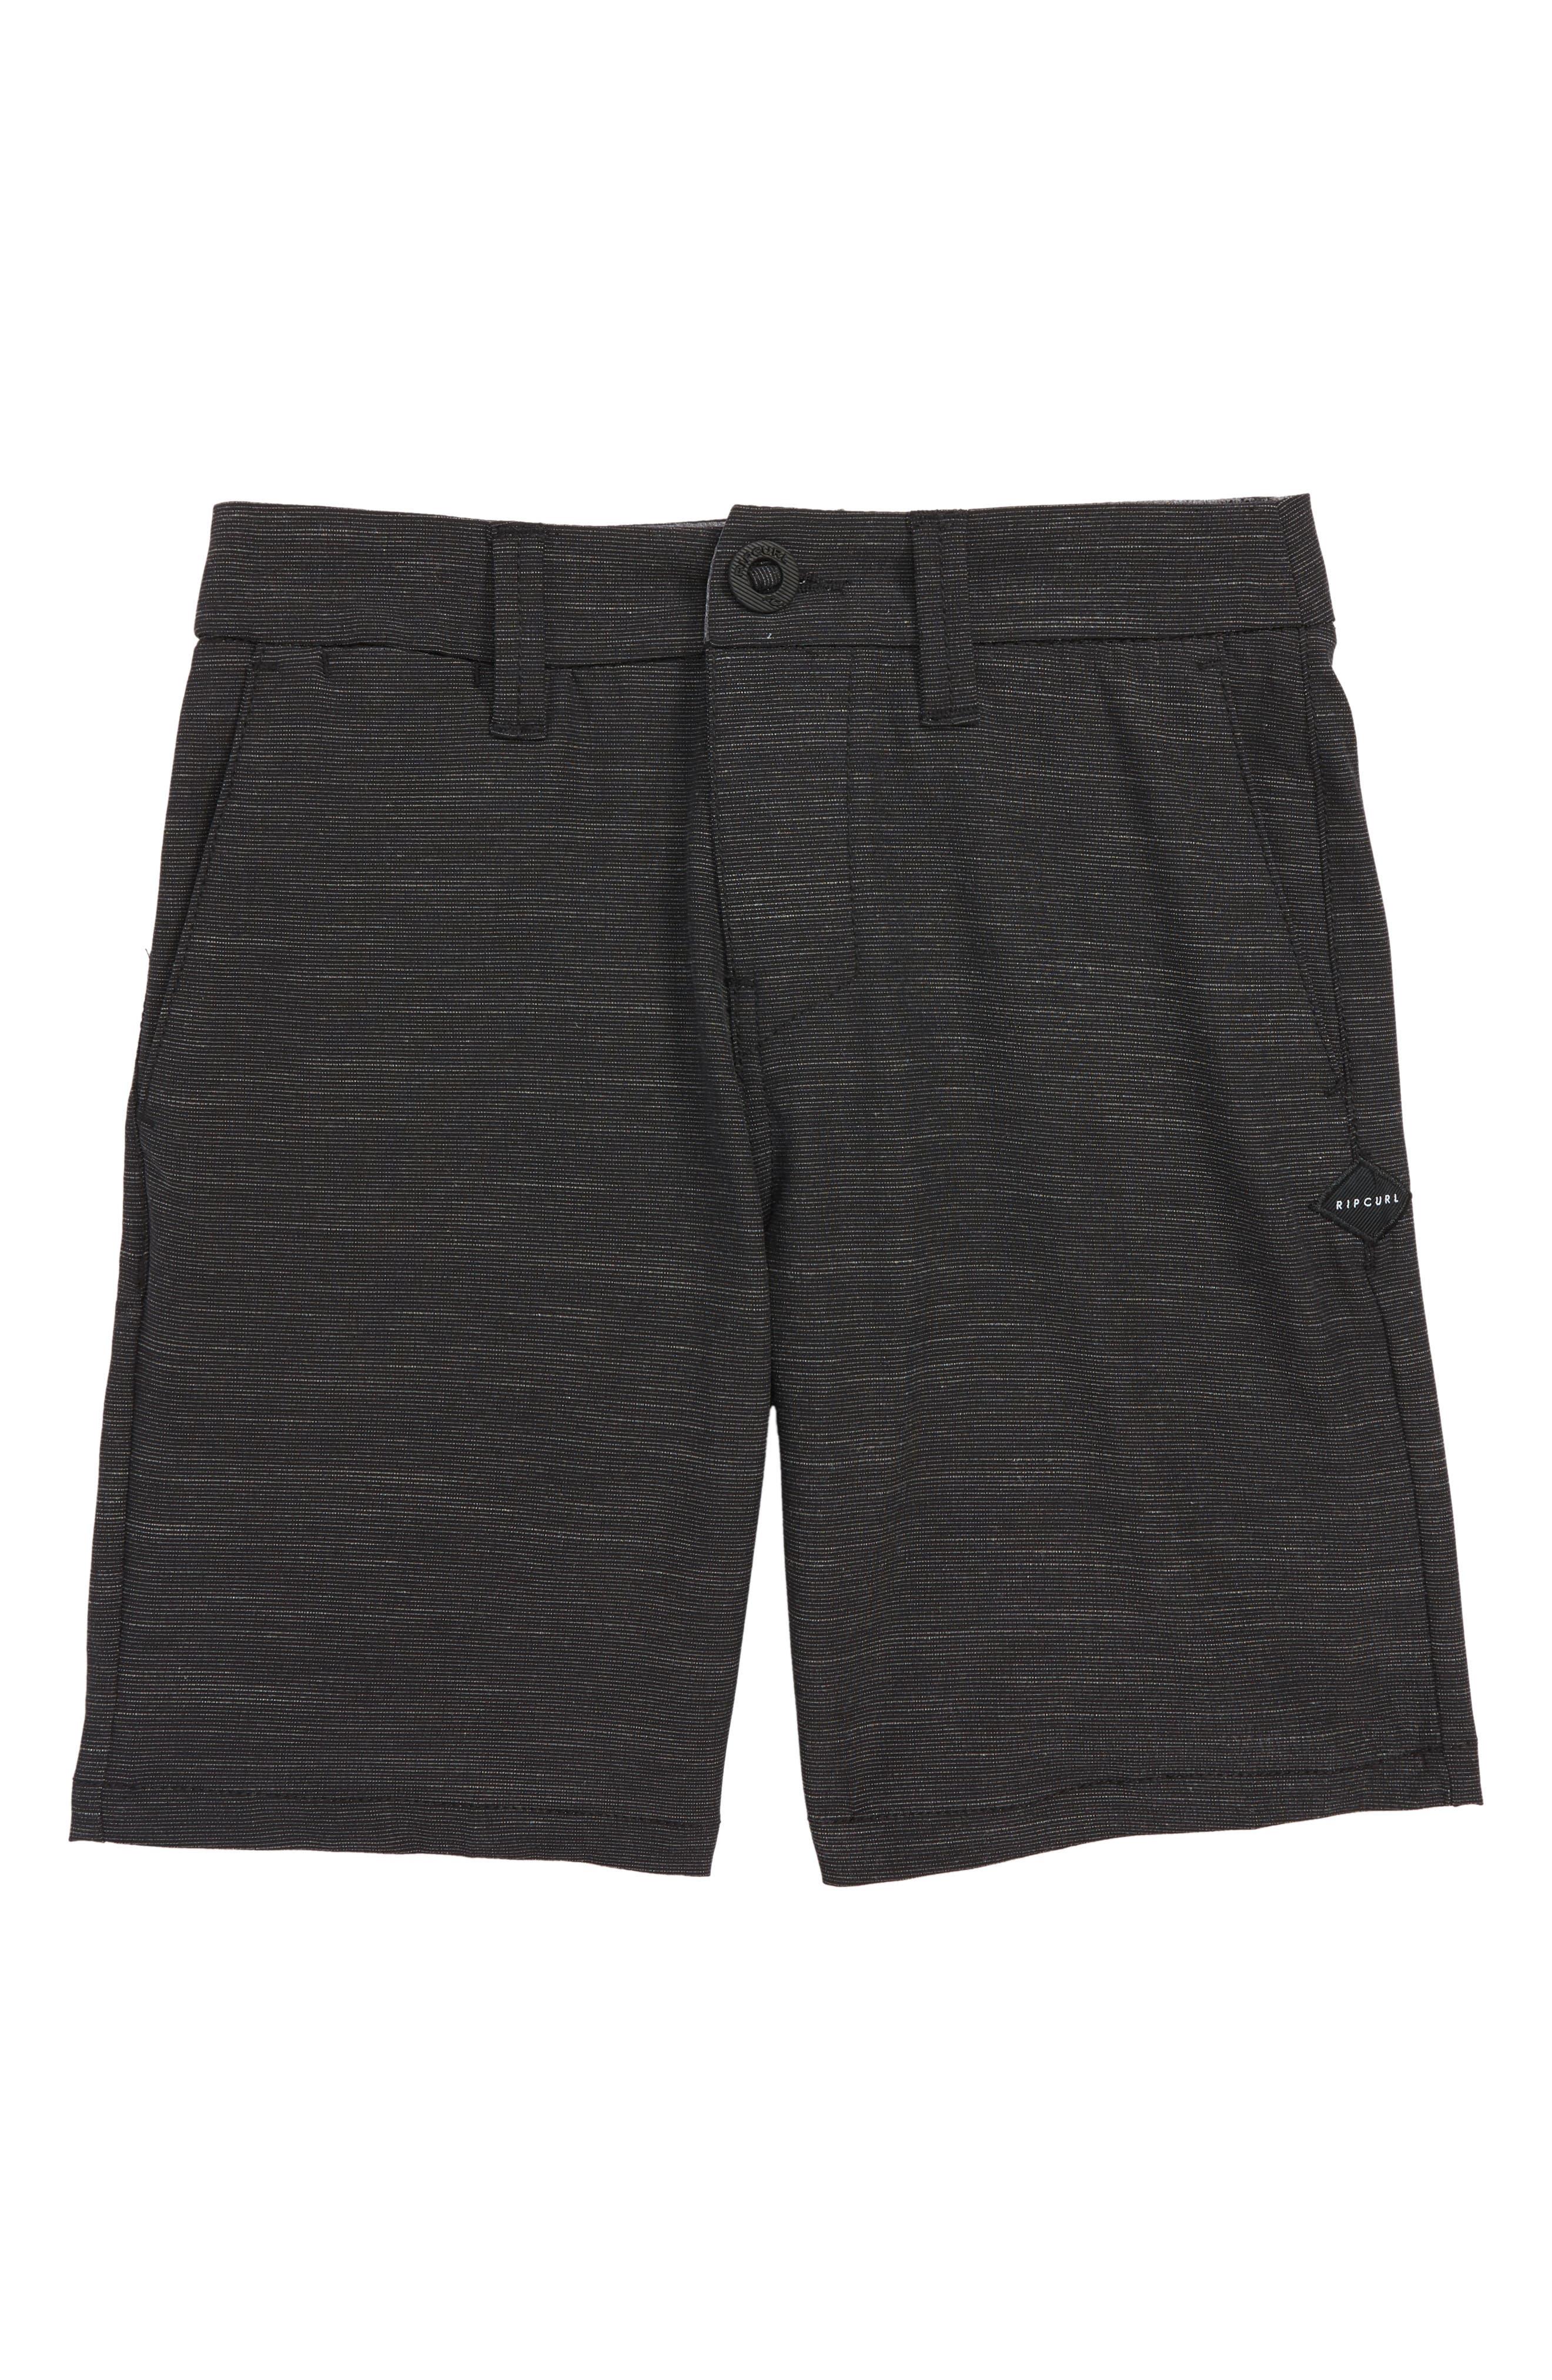 Mirage Jackson Boardwalk Board Shorts,                         Main,                         color, 001